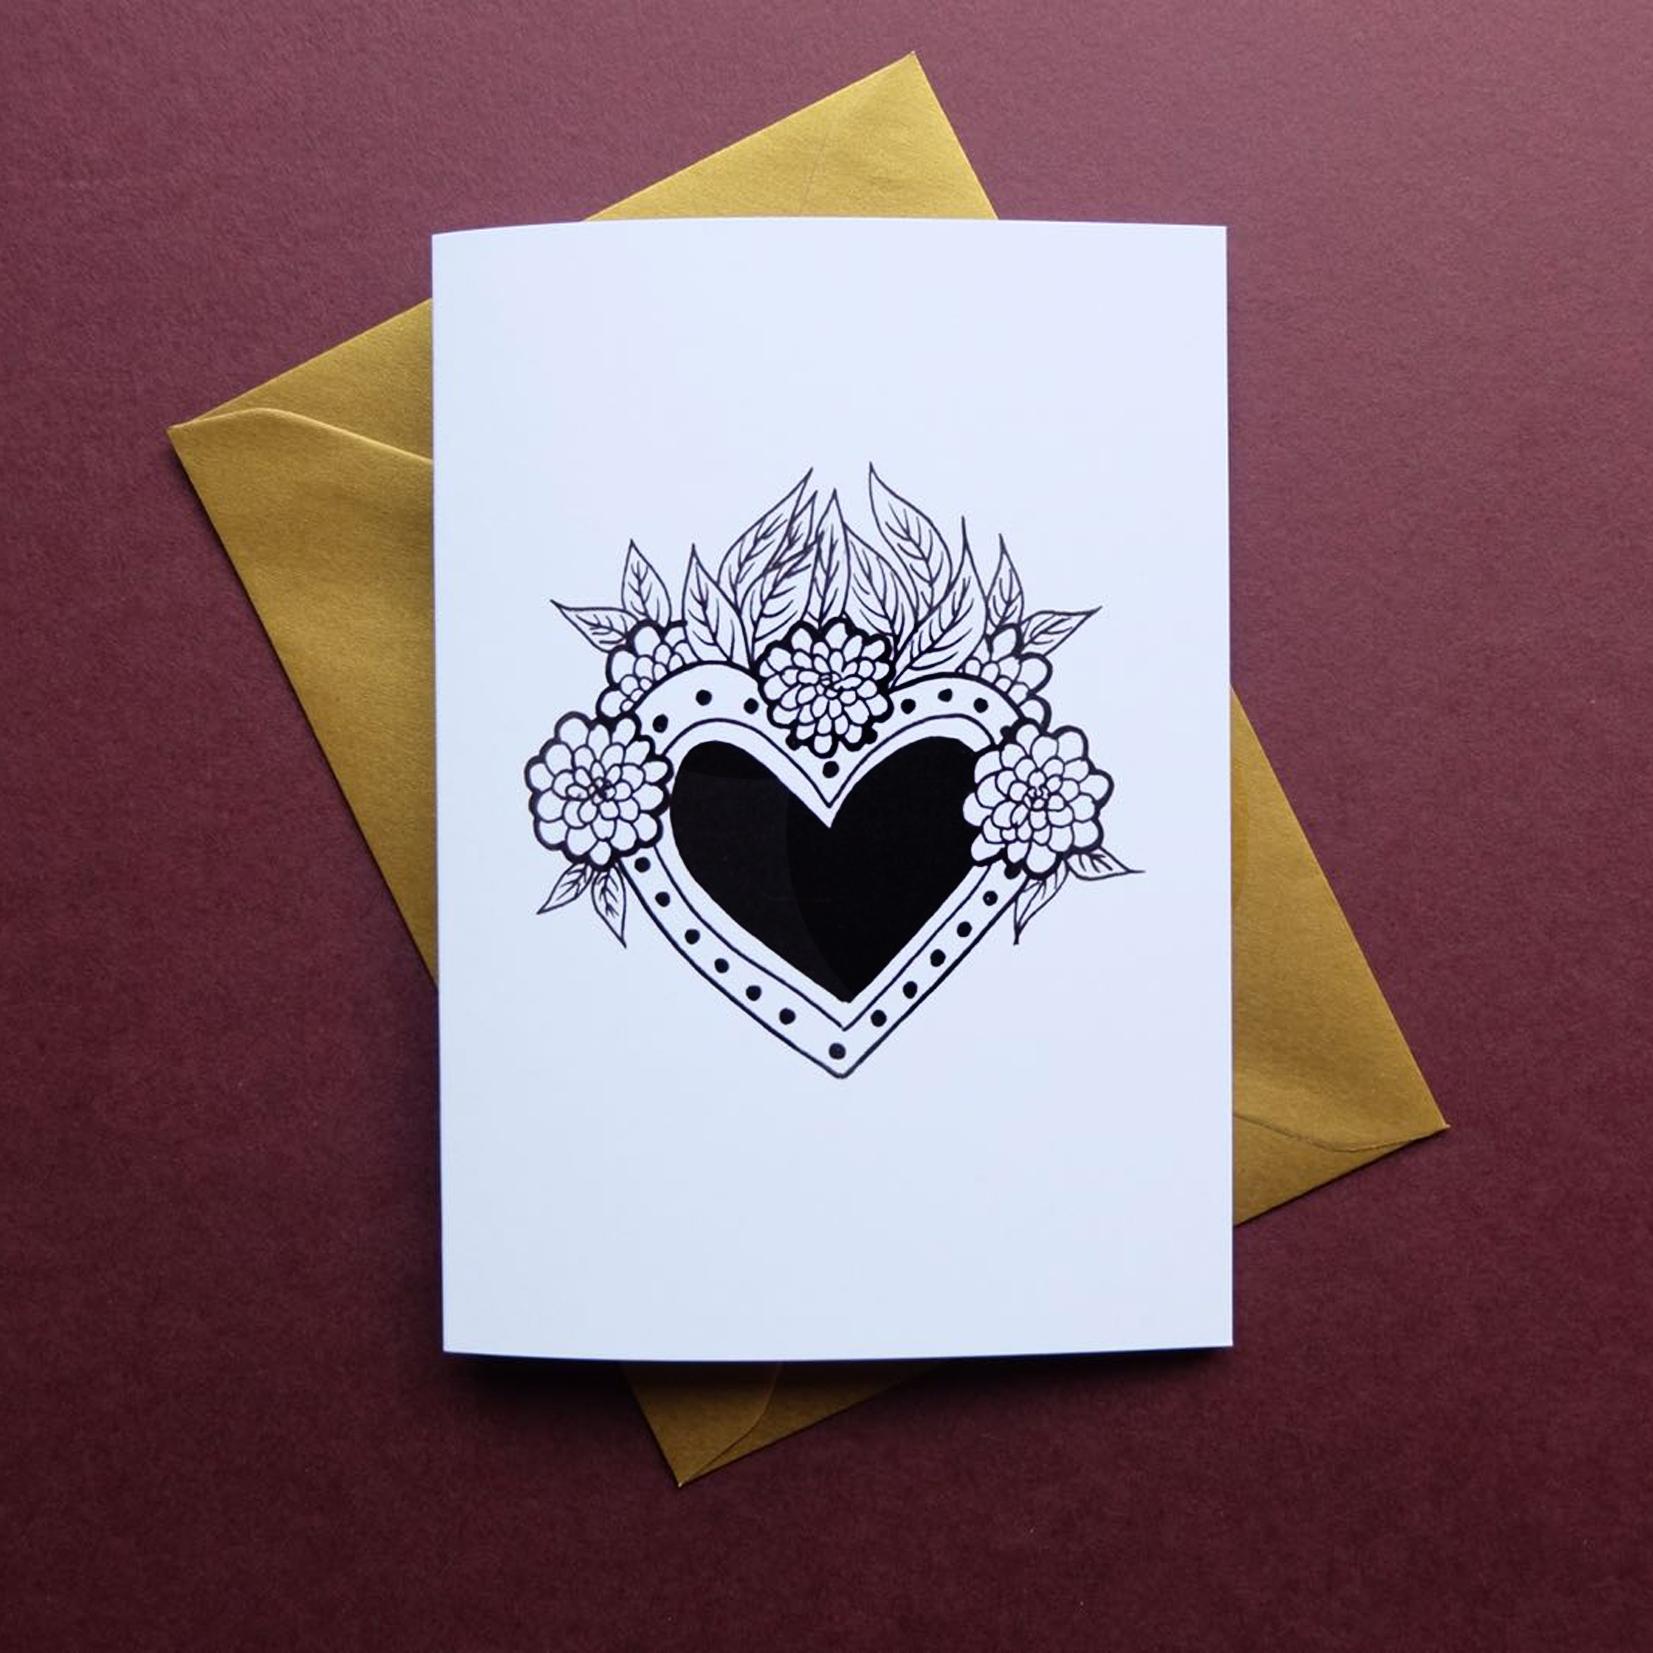 floral heart 1.jpg